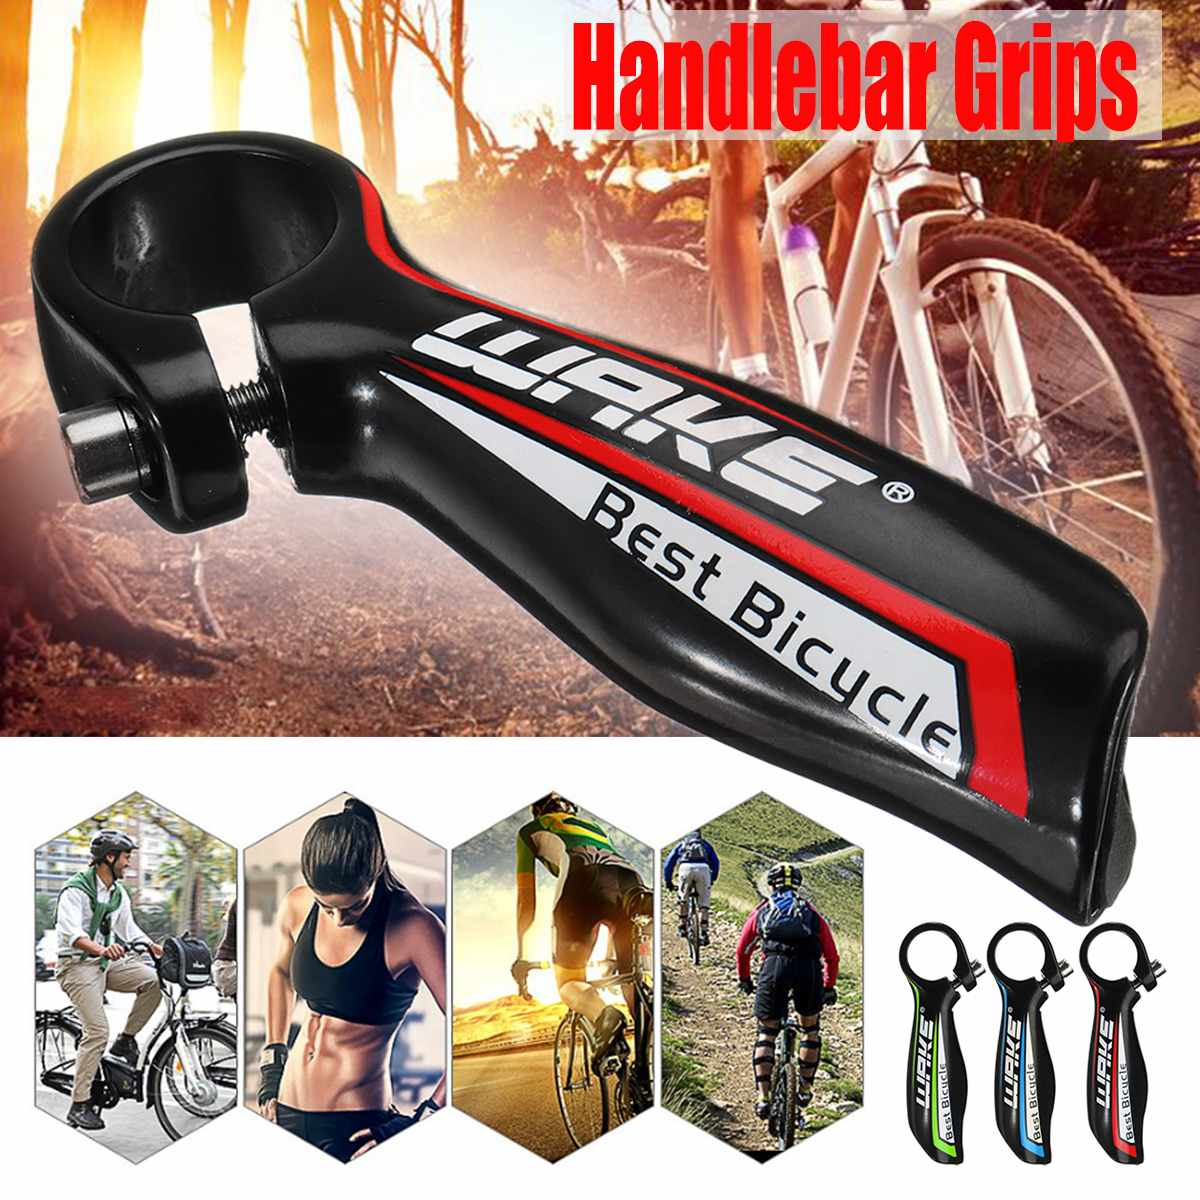 Bicycle Aluminum Handlebar End Grips Fit 22.2MM MTB Mountain Bike Handle Bars